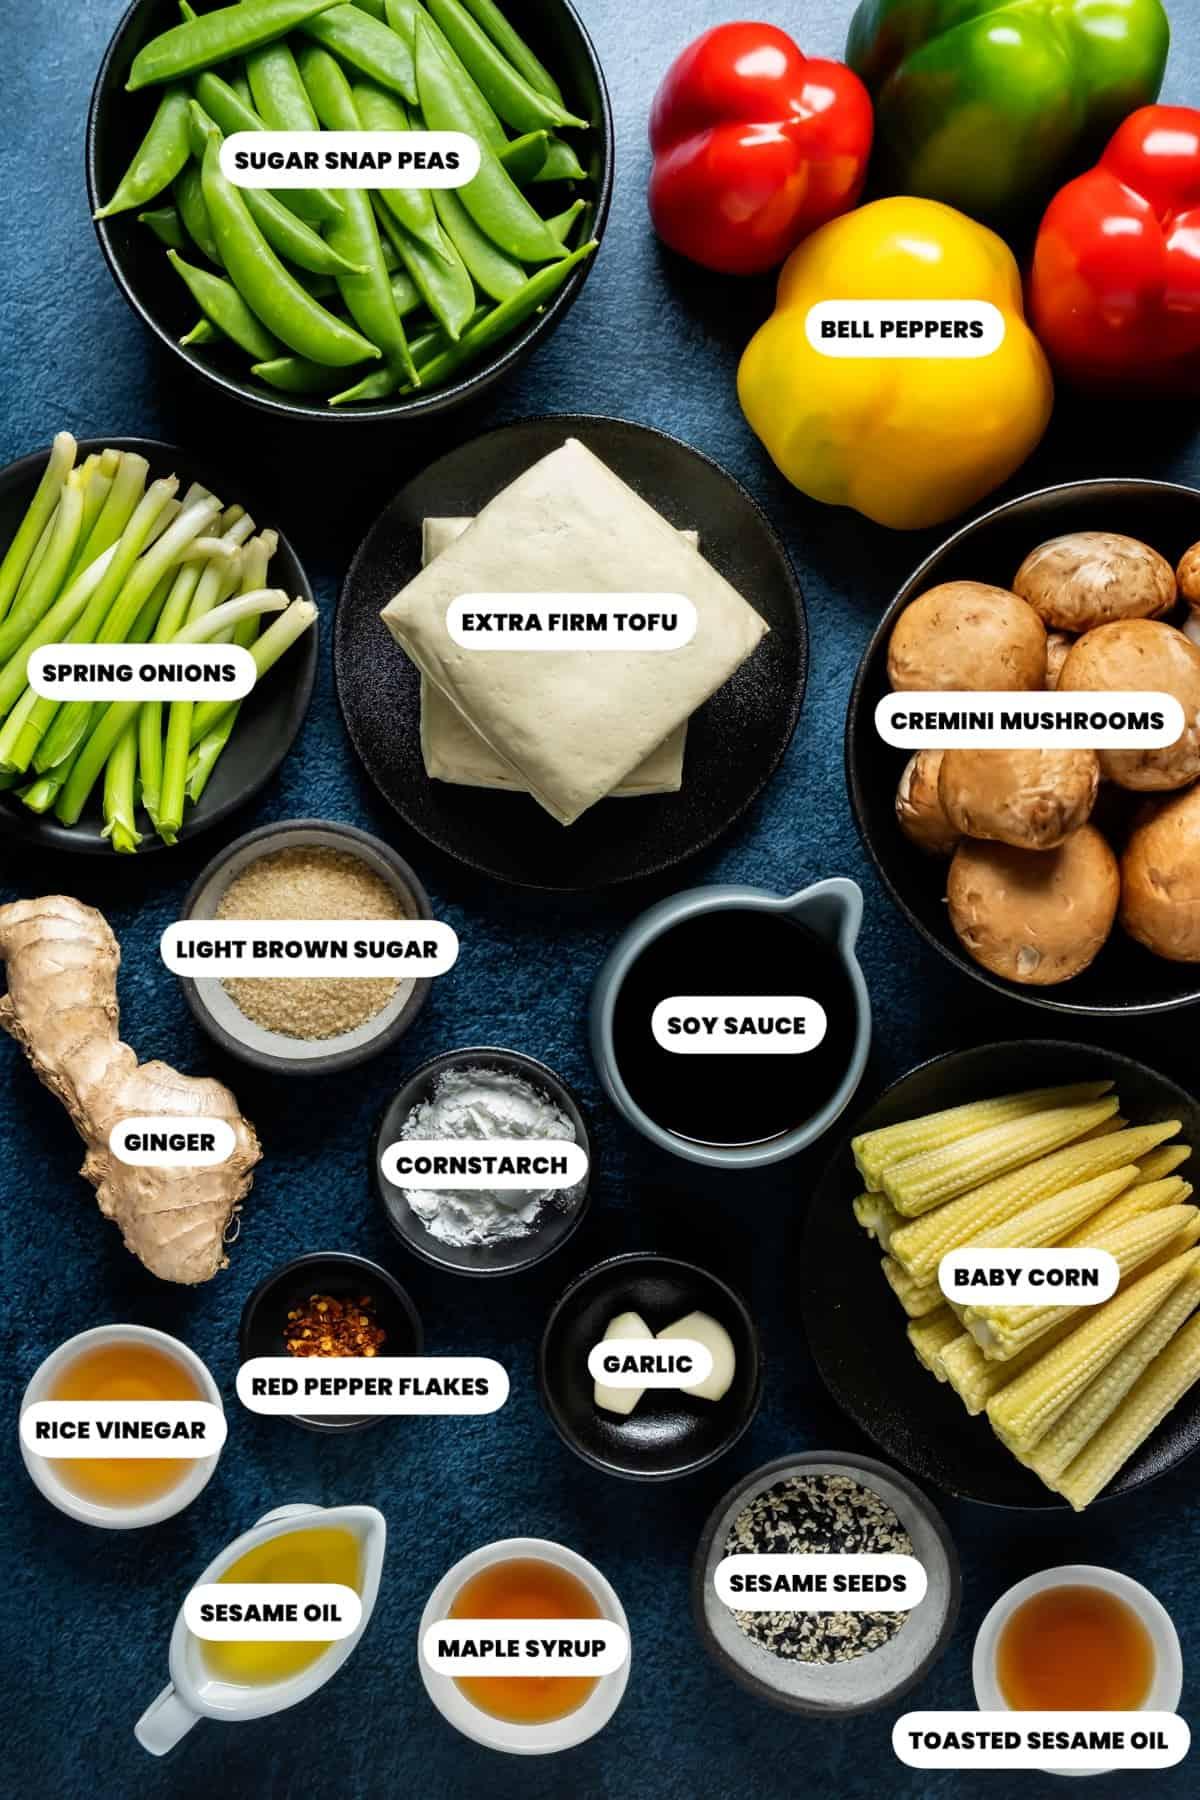 Photo of the ingredients needed to make vegan stir fry.